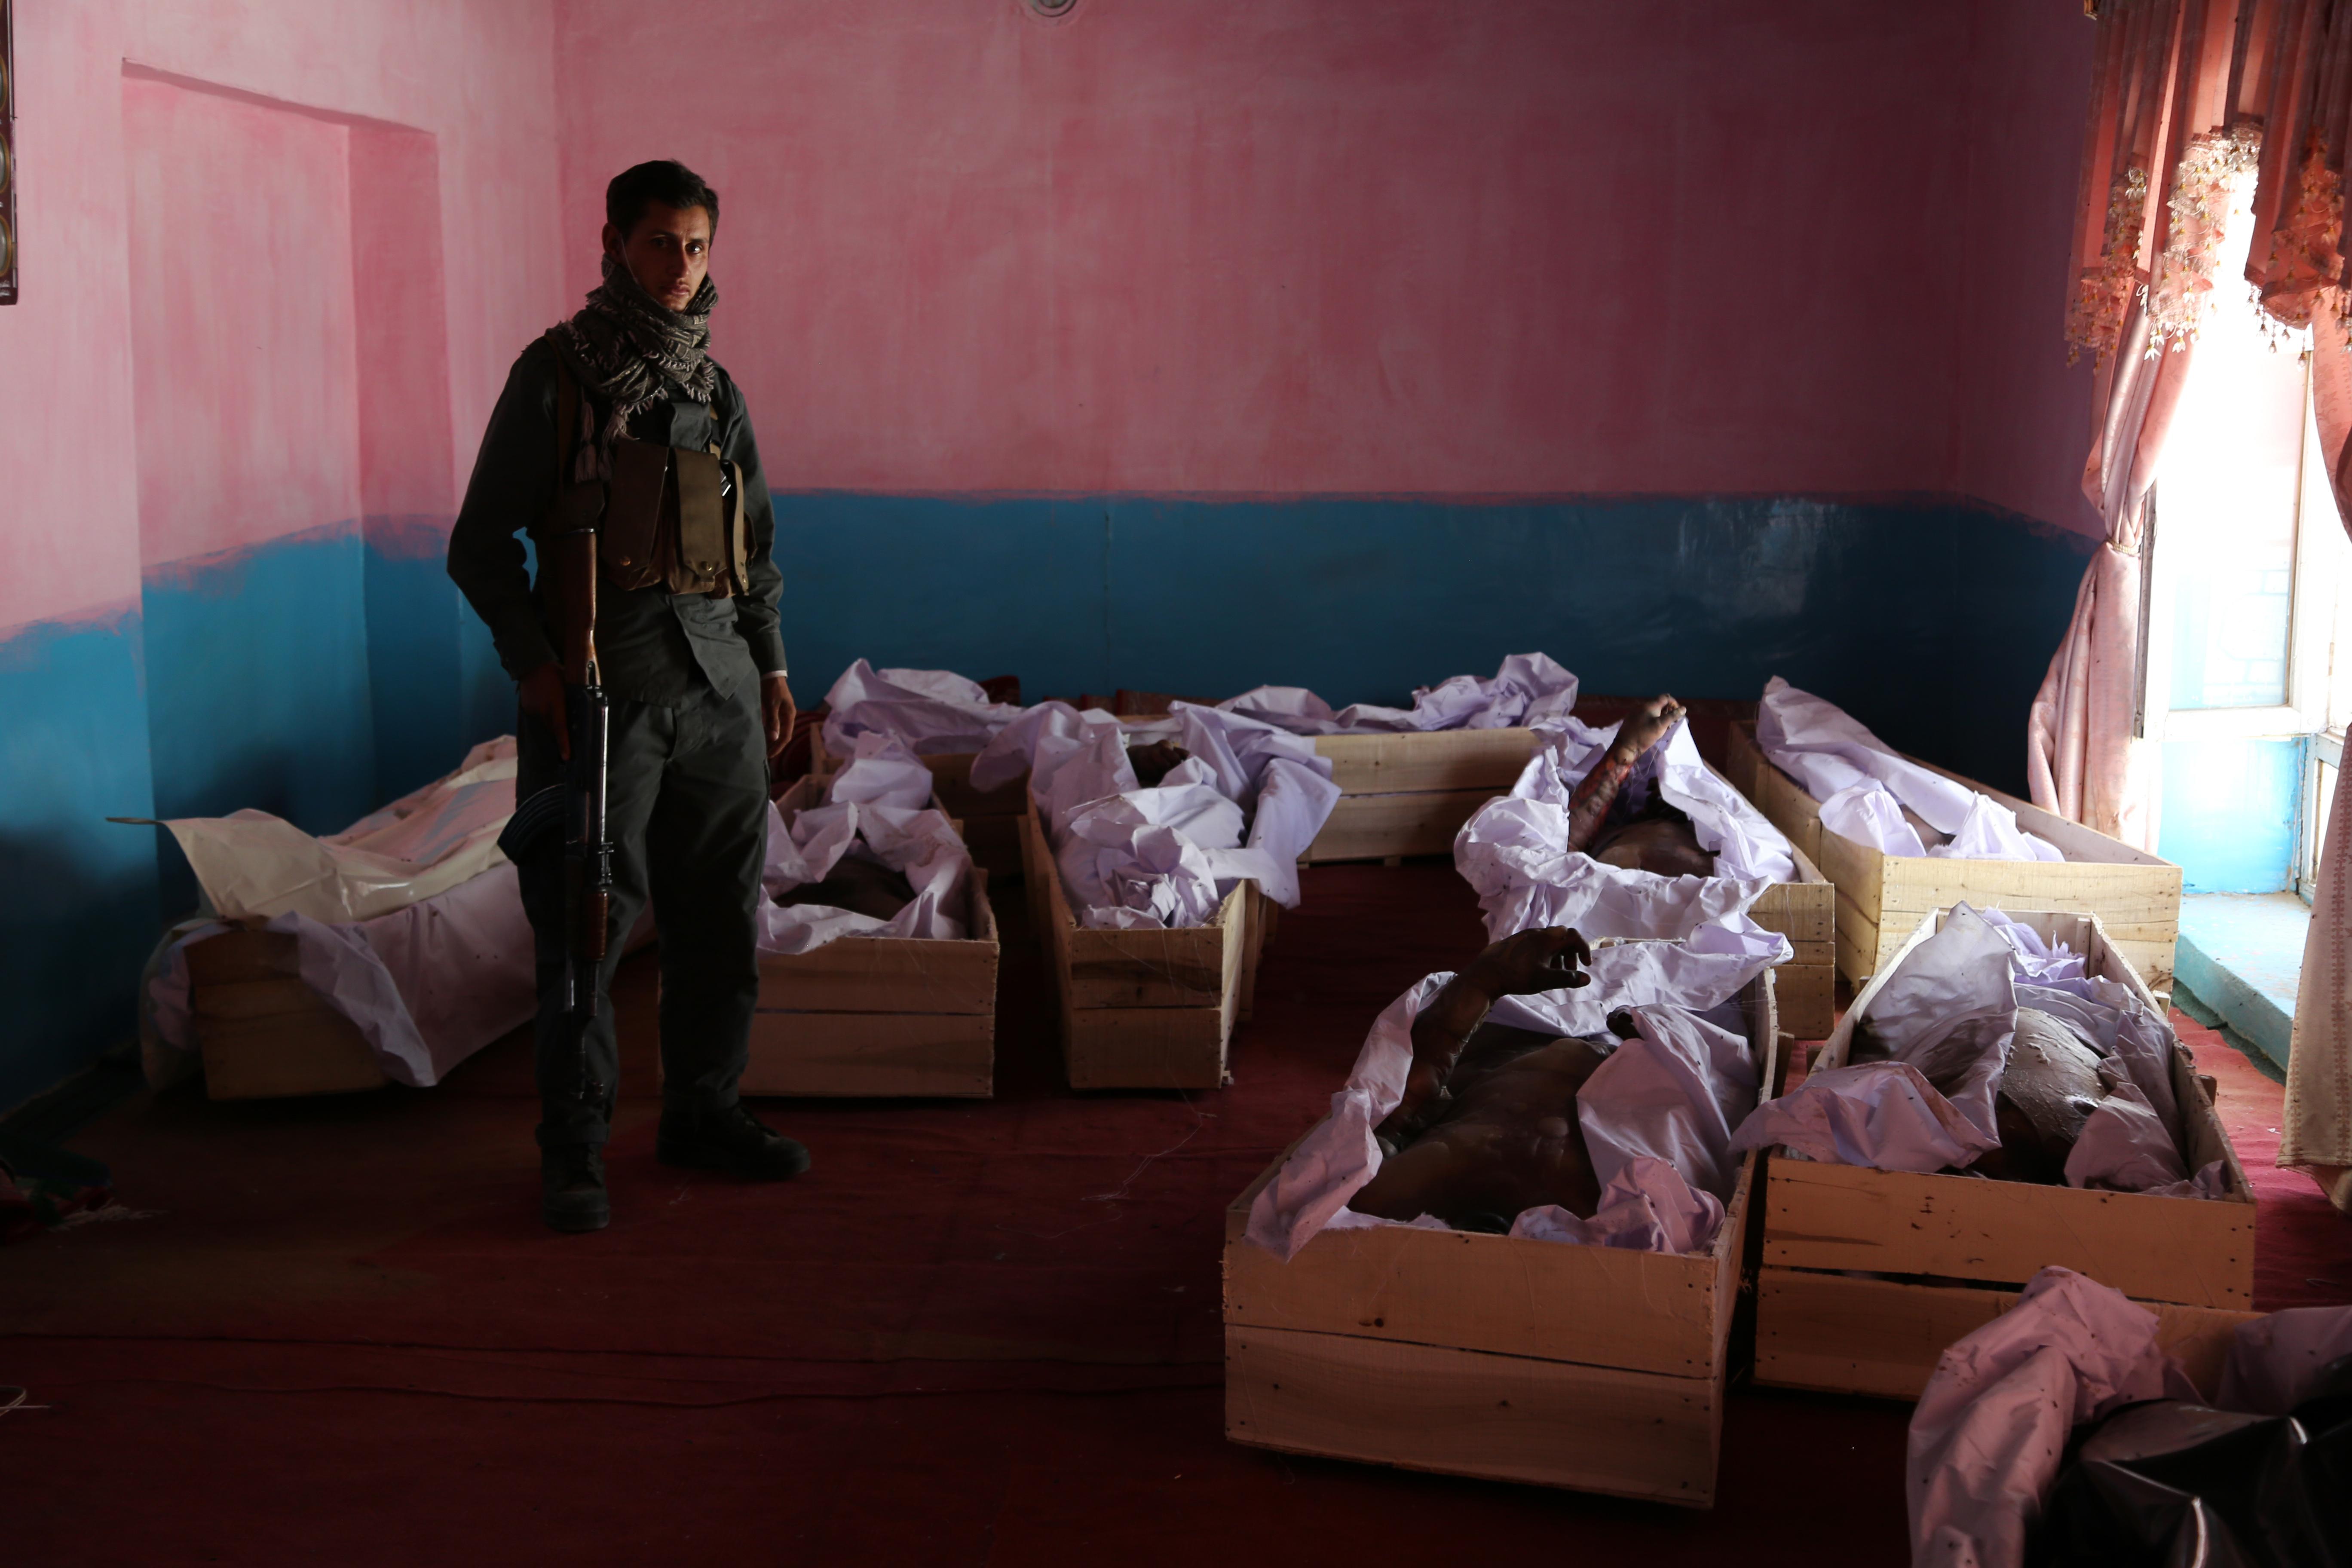 Afghans reel from Taliban's blood-soaked rampage in Ghazni